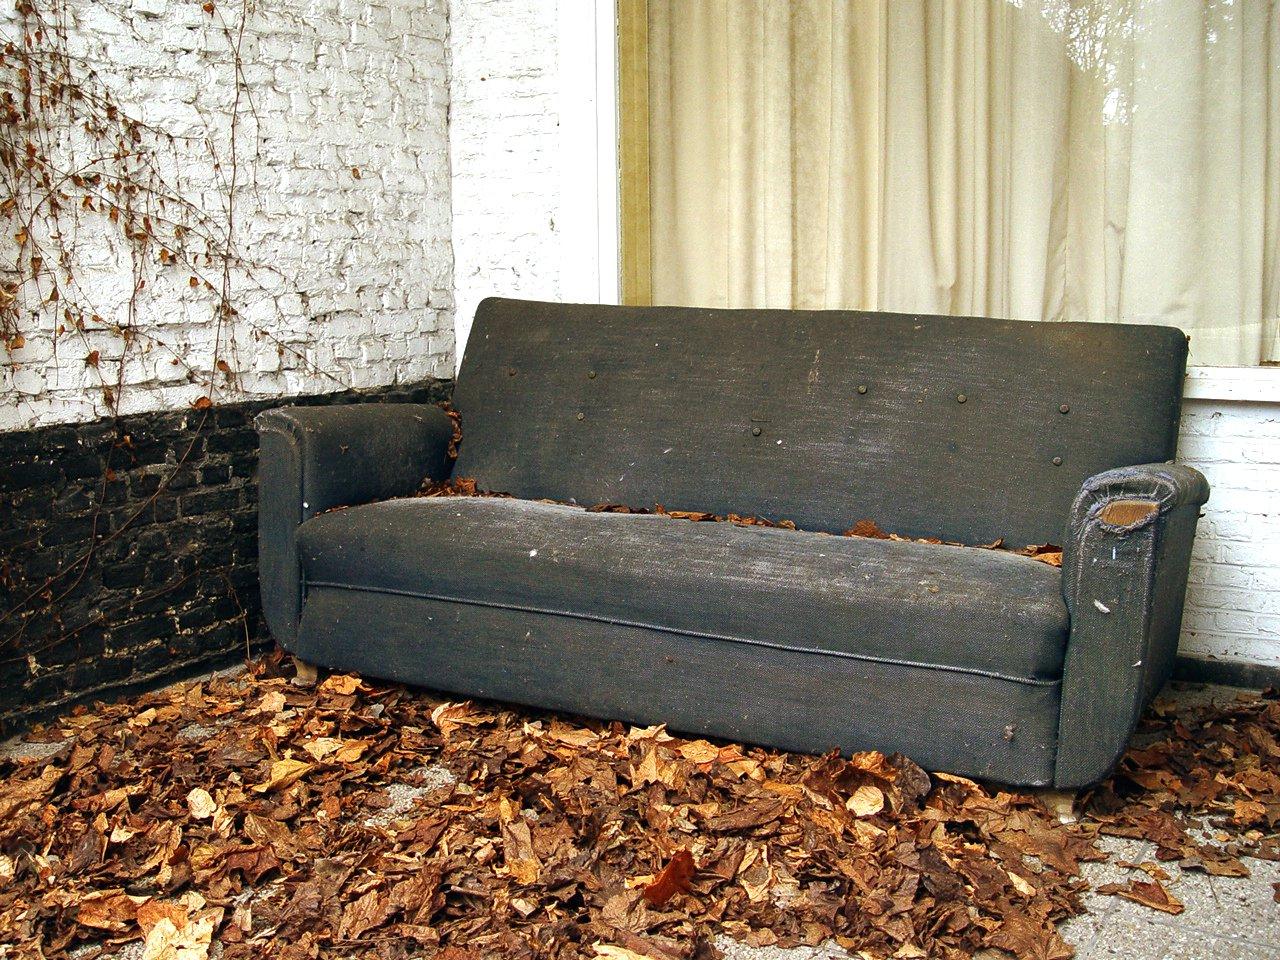 Old Sofa Photo Files 1479183 Freeimages Com